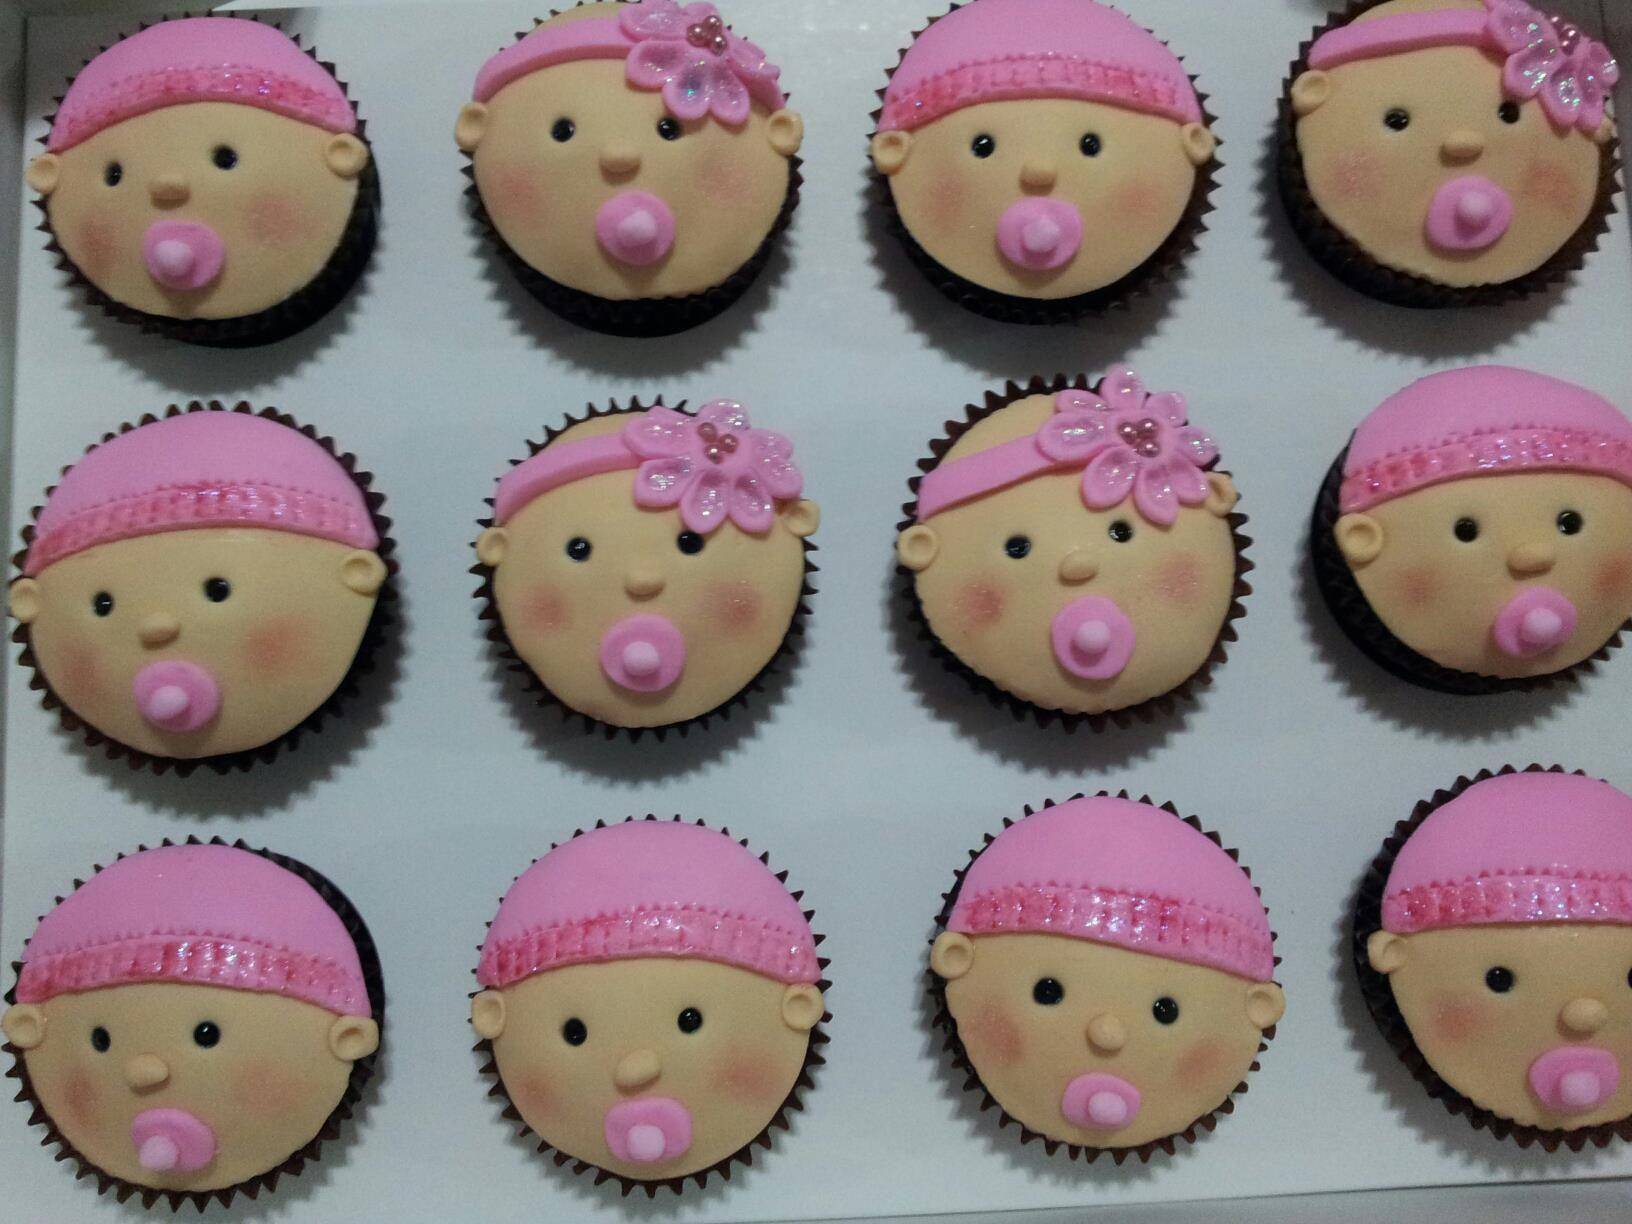 Baby Shower Cupcake Ideas Cute Cupcake Ideas Created By Cupcakes